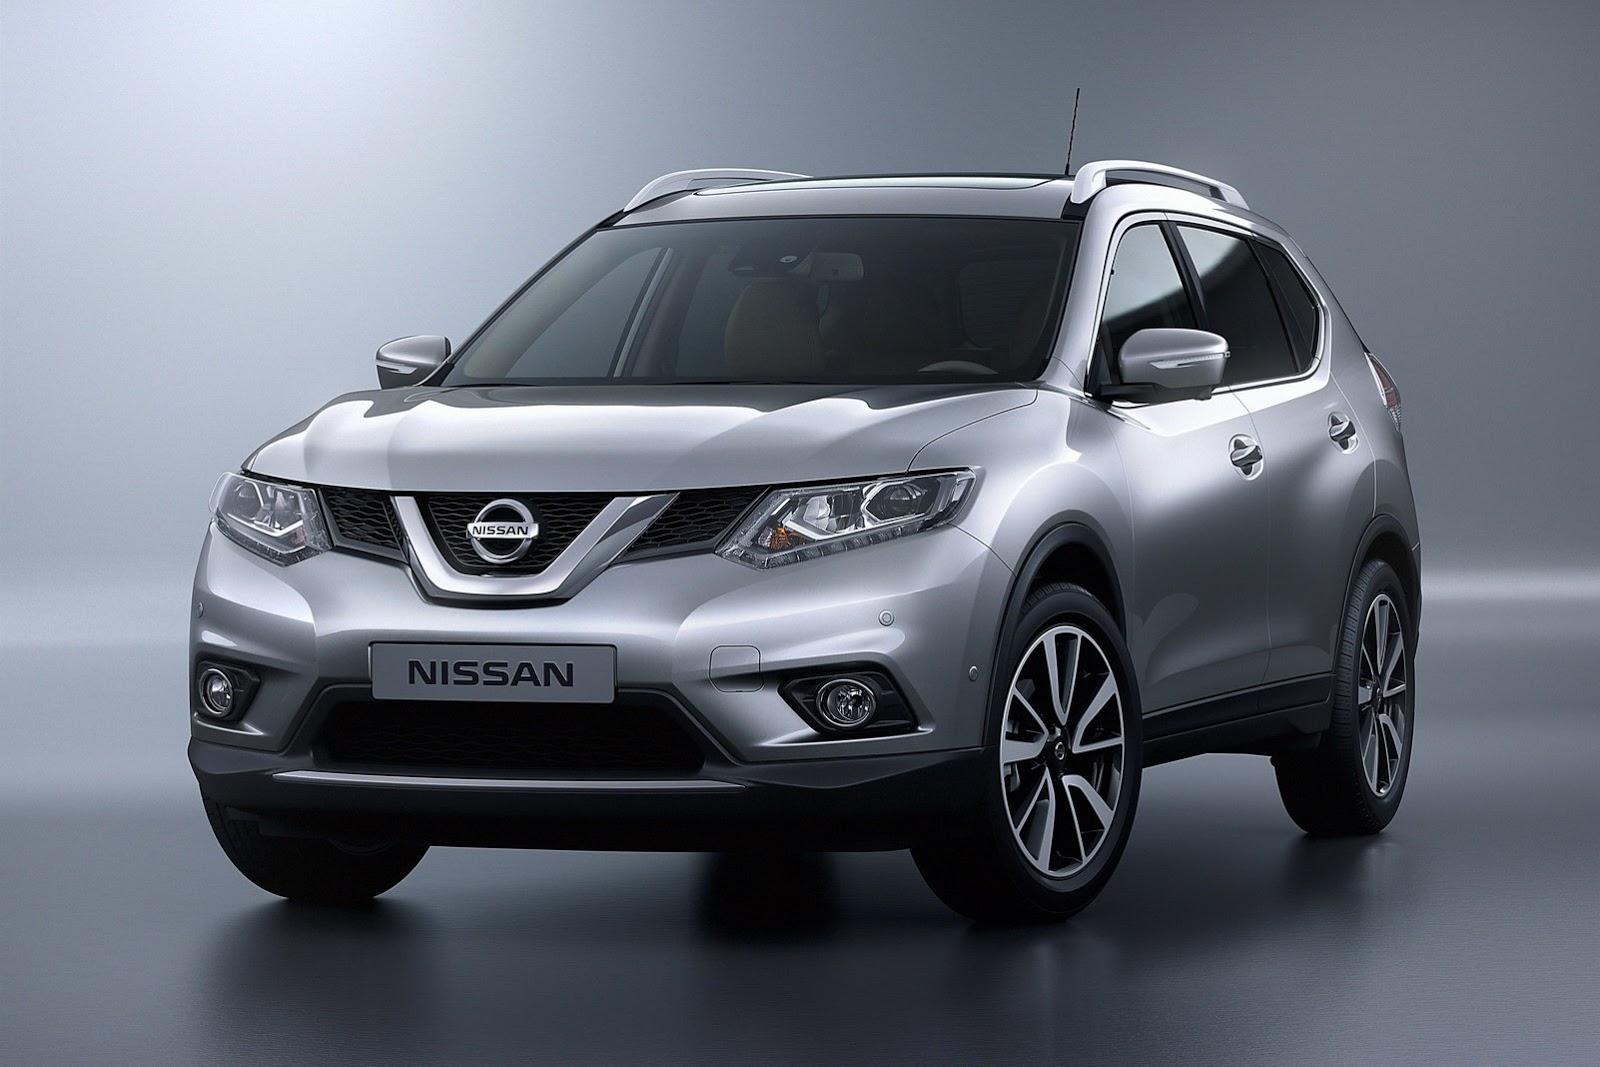 Malaysia Motoring News: 2014 Nissan XTrail Gets Sleeker